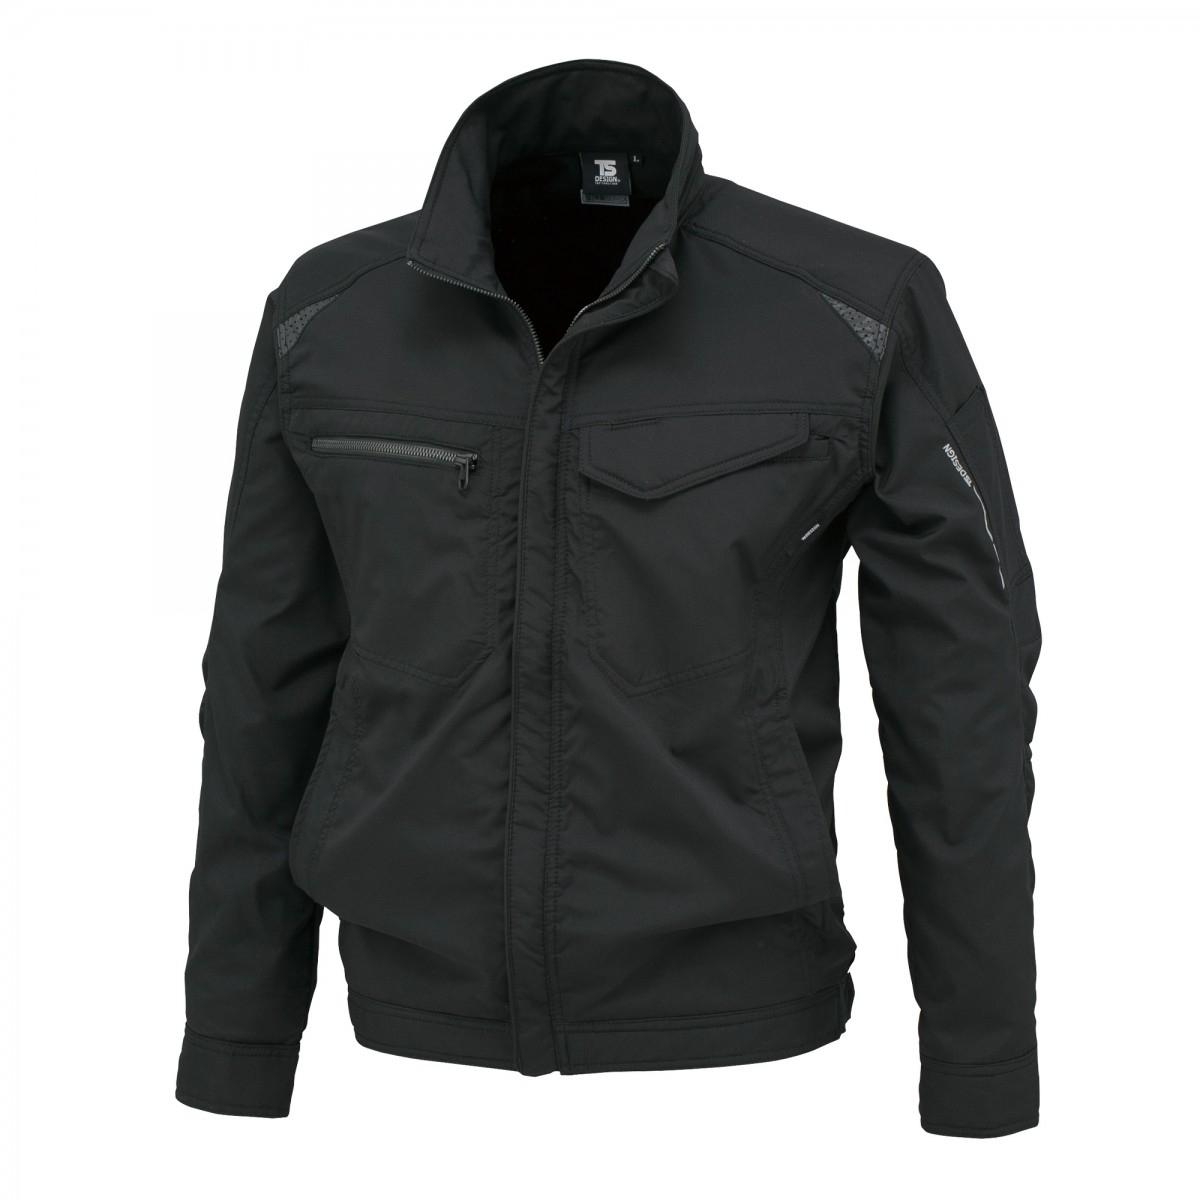 TS DESIGN 84636 ジャケット ¥5,940(税込)95 ブラック